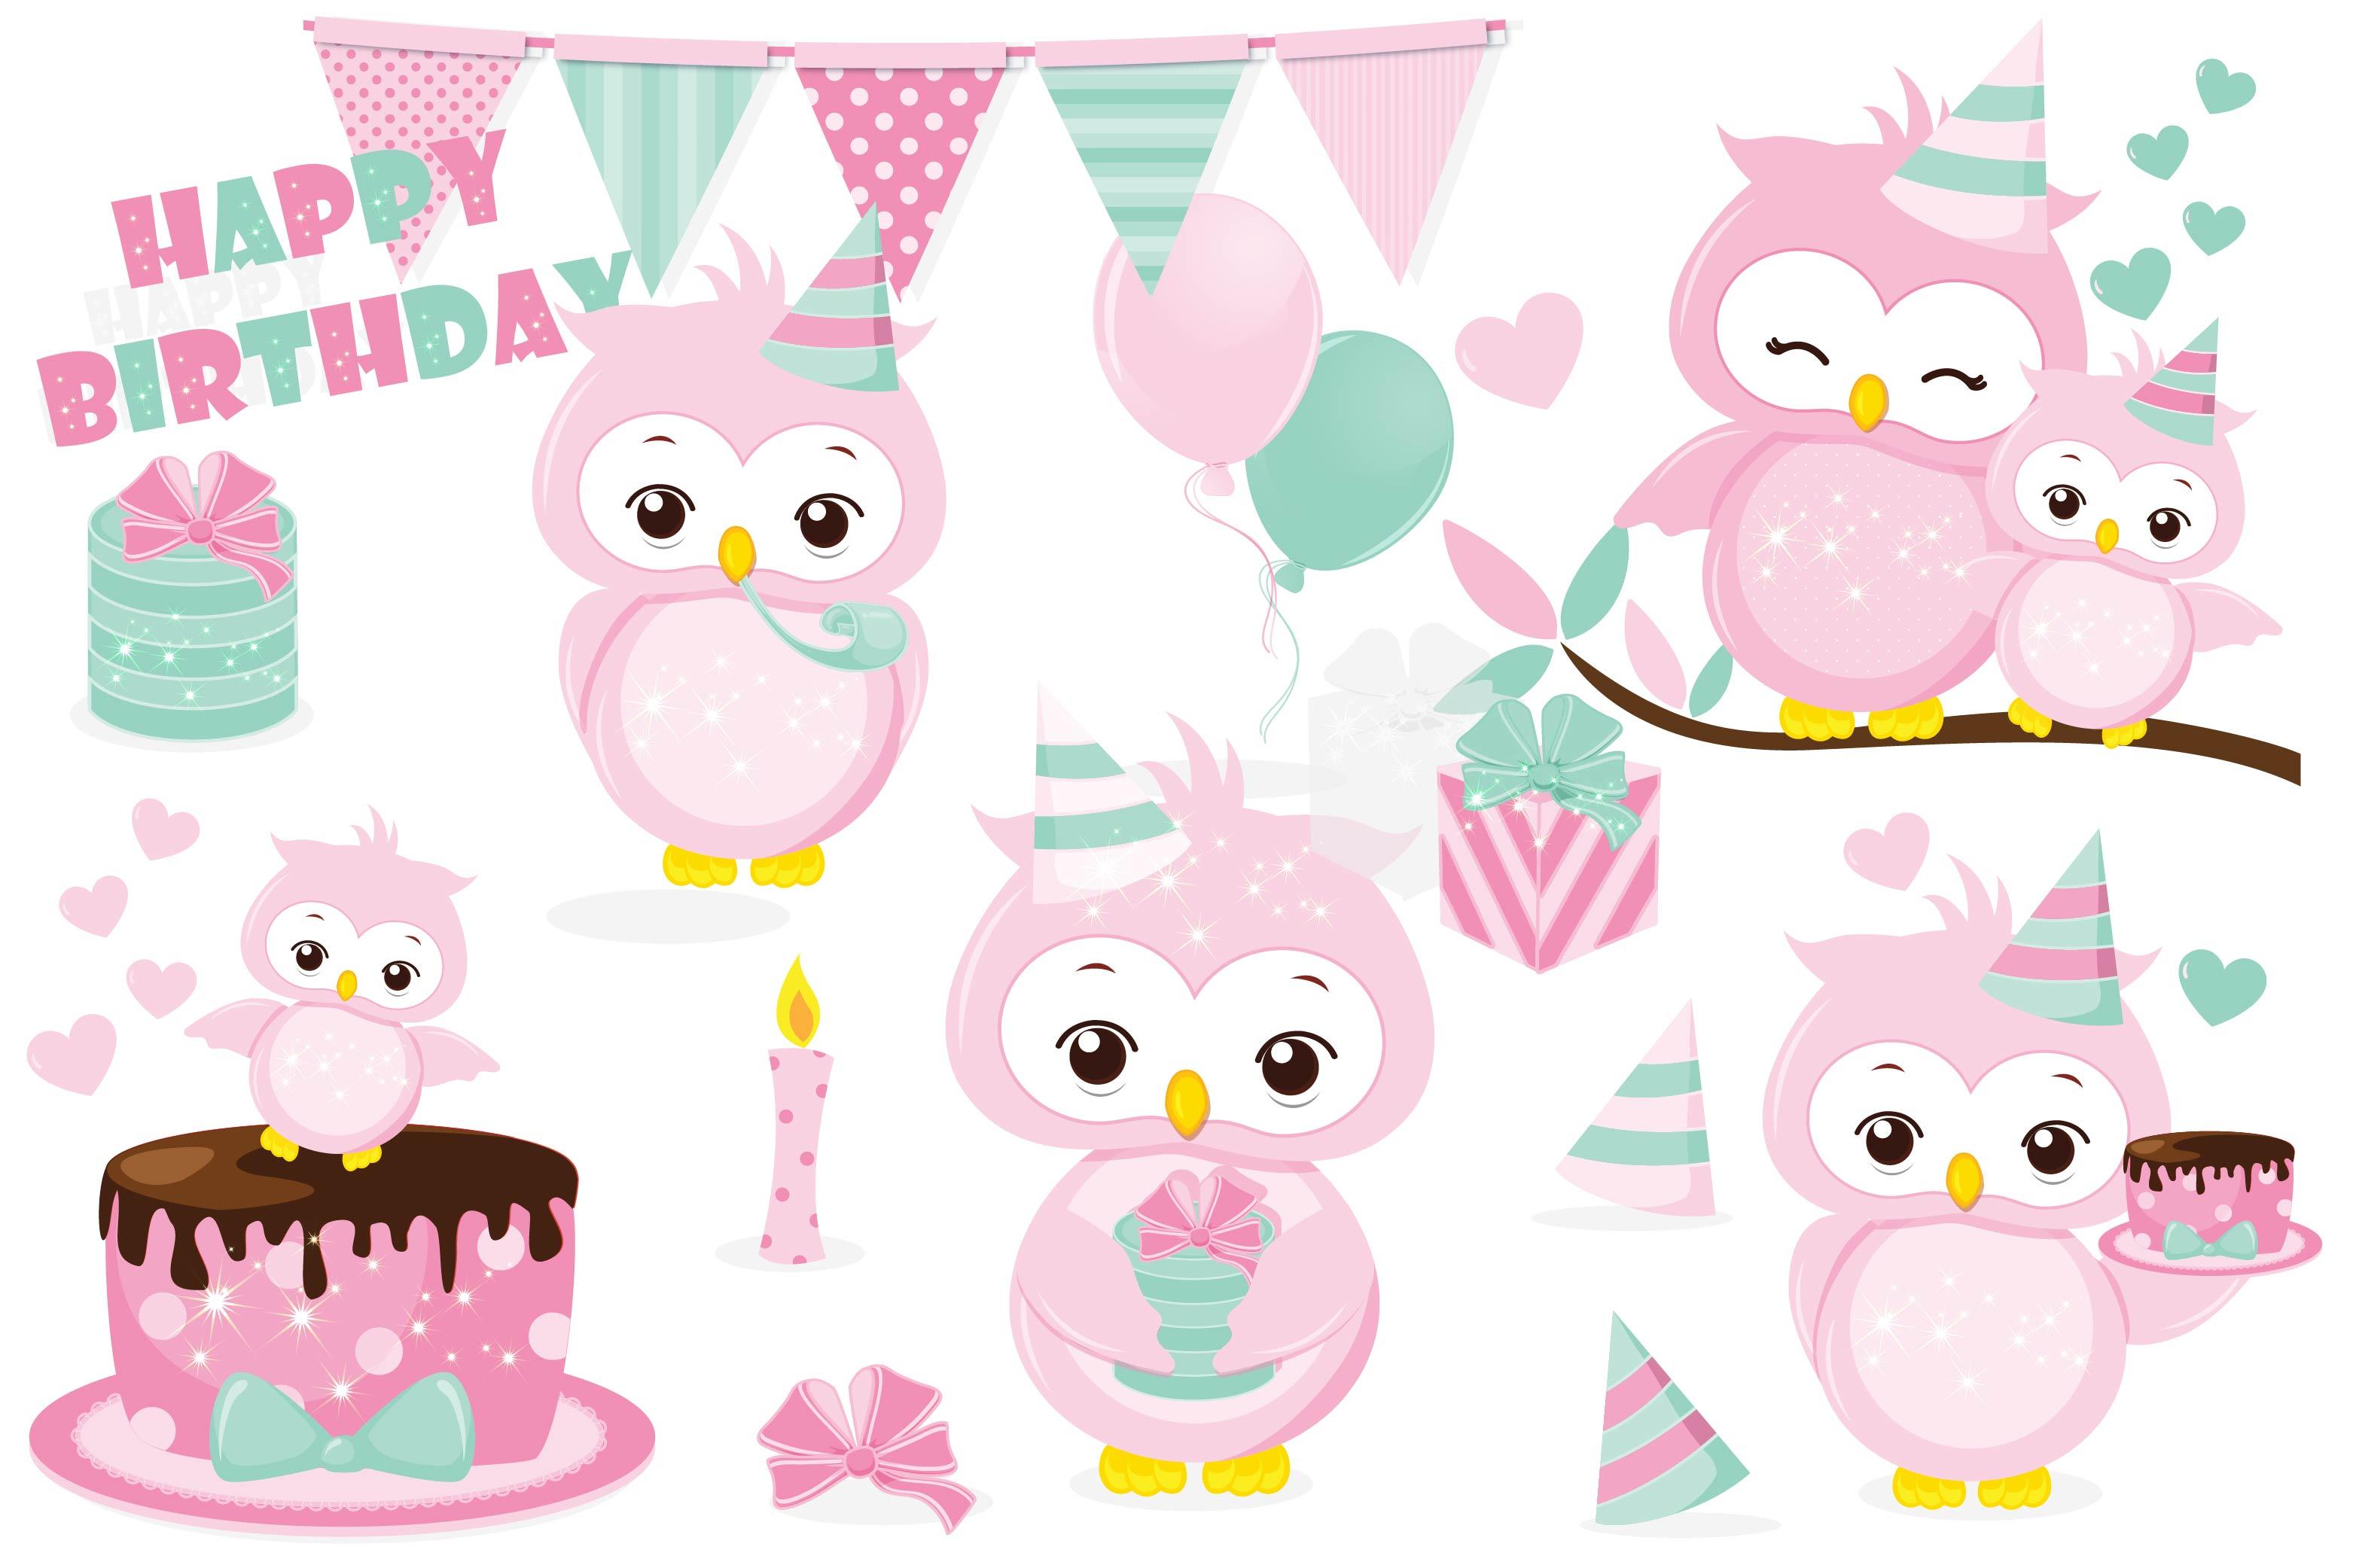 Birthday owl clipart, Birthday owl graphics.